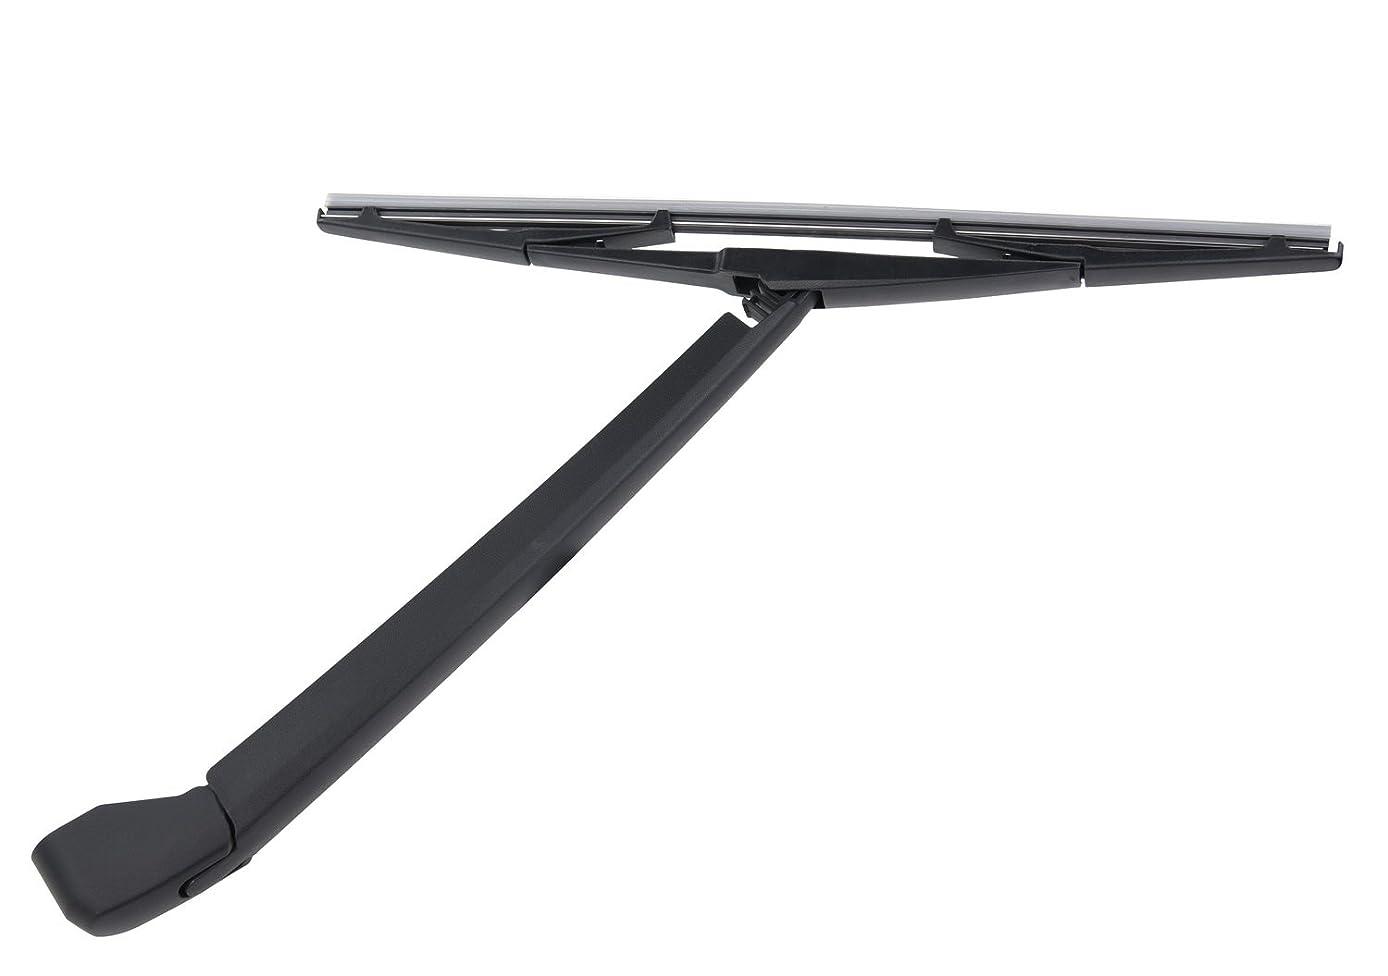 QUWEI Rear Windshield Wiper Arm for Mazda CX-9 MAZDA CX7 2007 2008 2009 2010 2011 2012